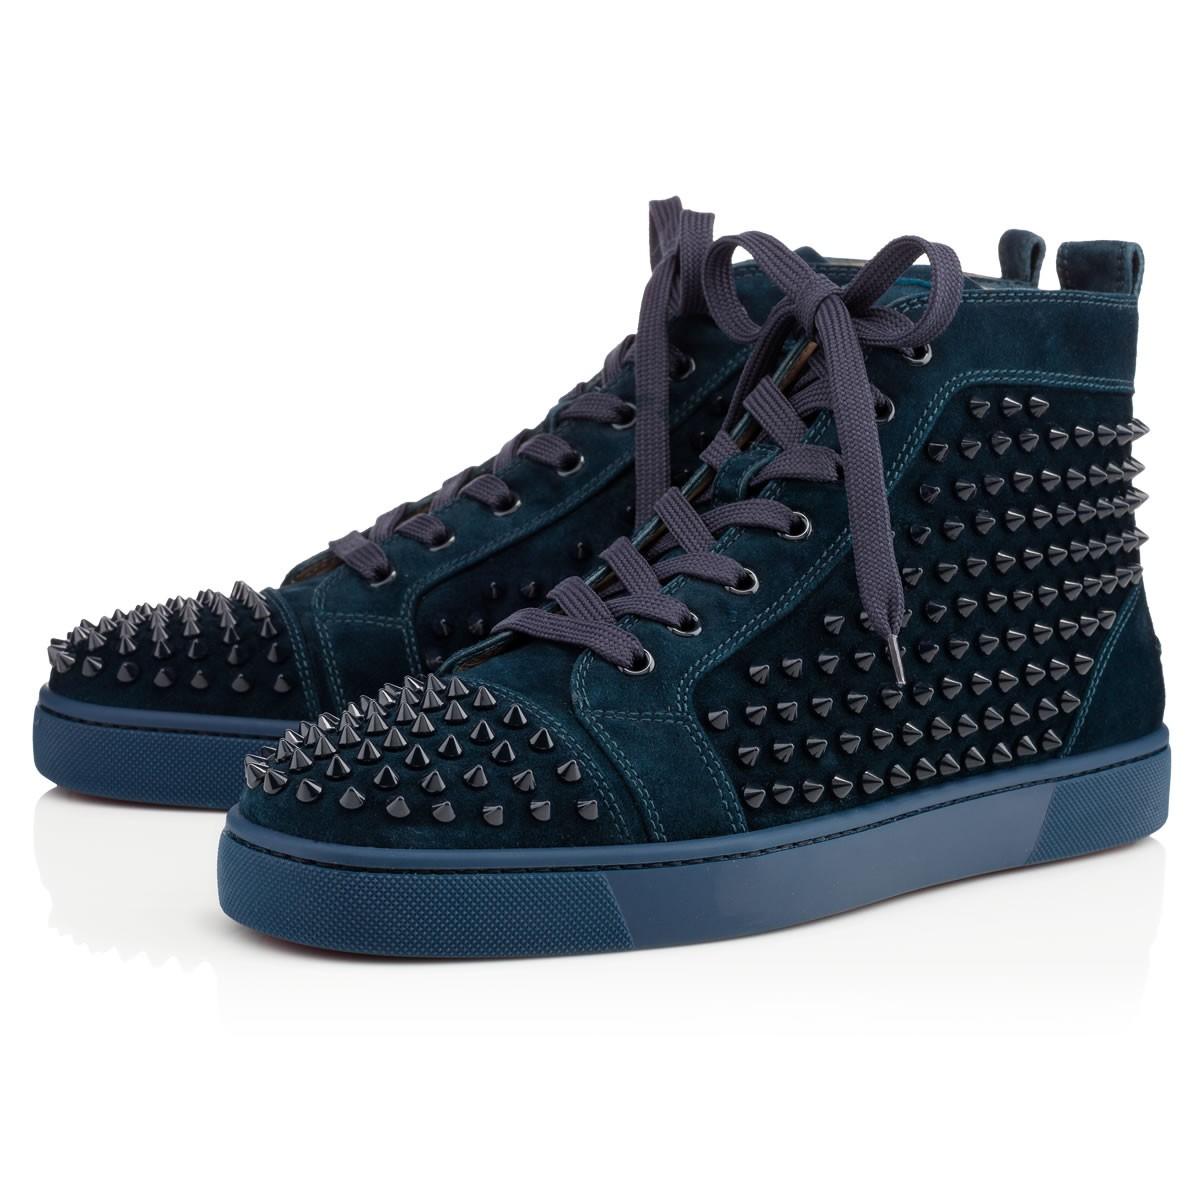 Bottega Veneta Mens Shoes Replica